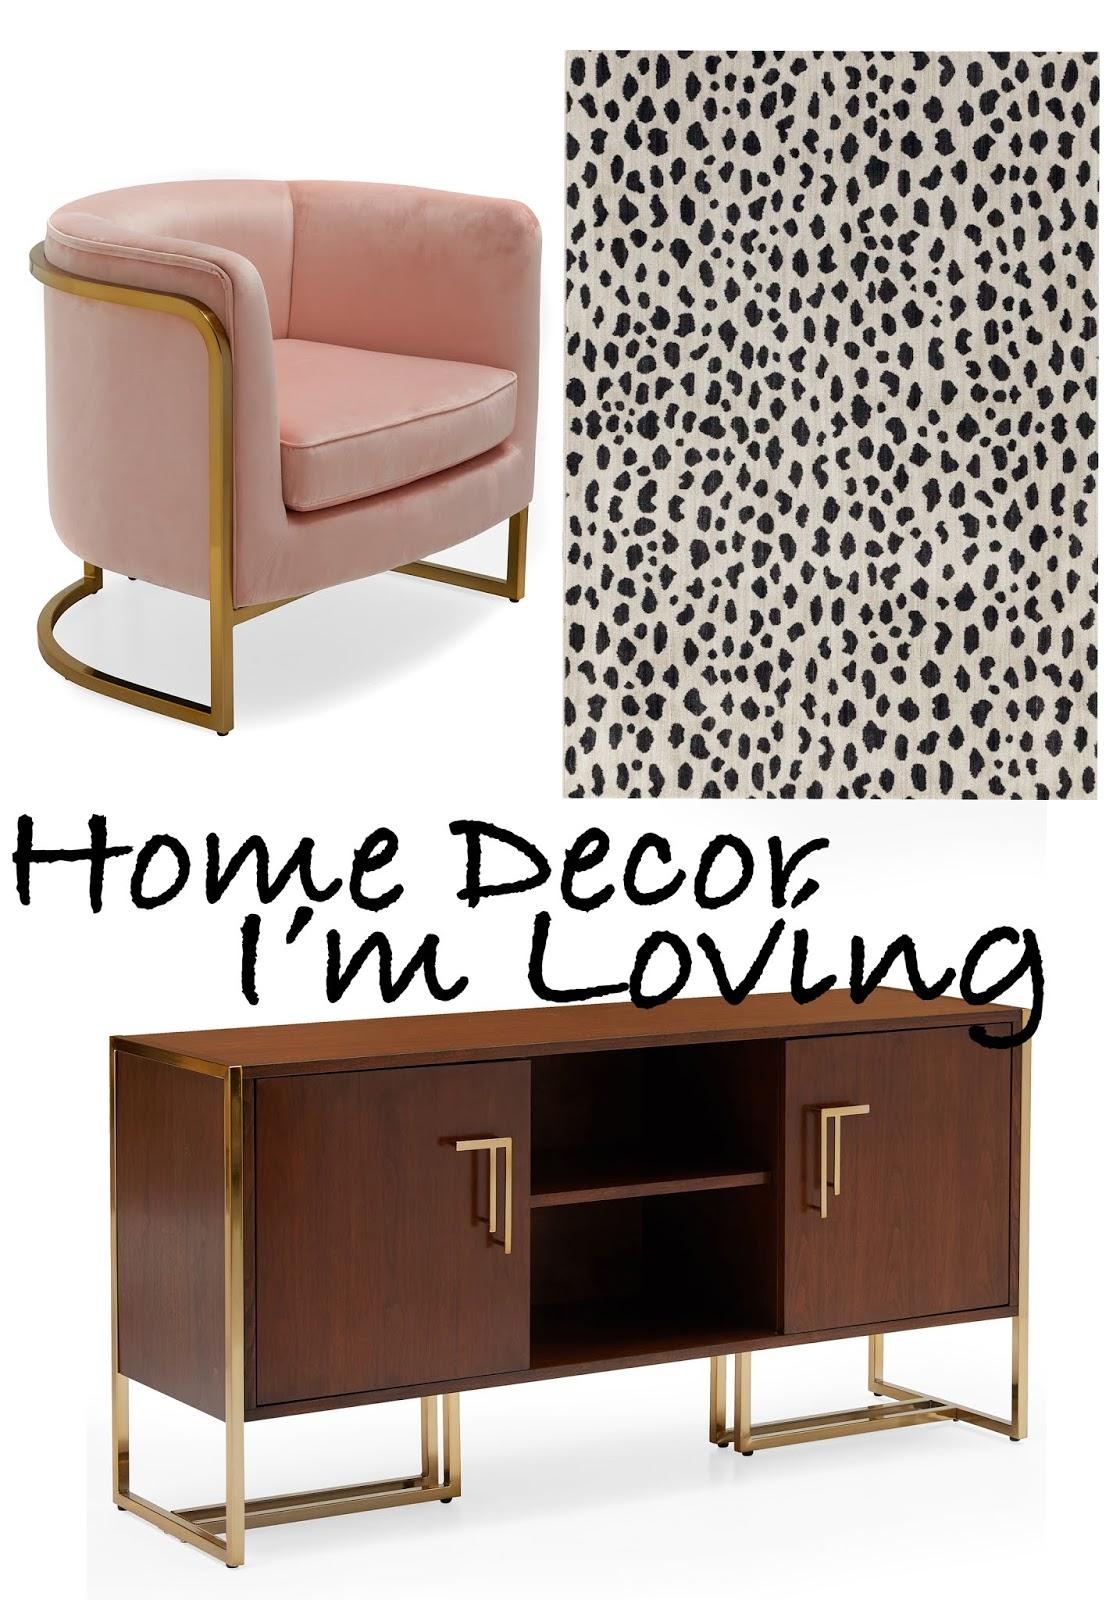 Home Decor I'm Loving Right Now